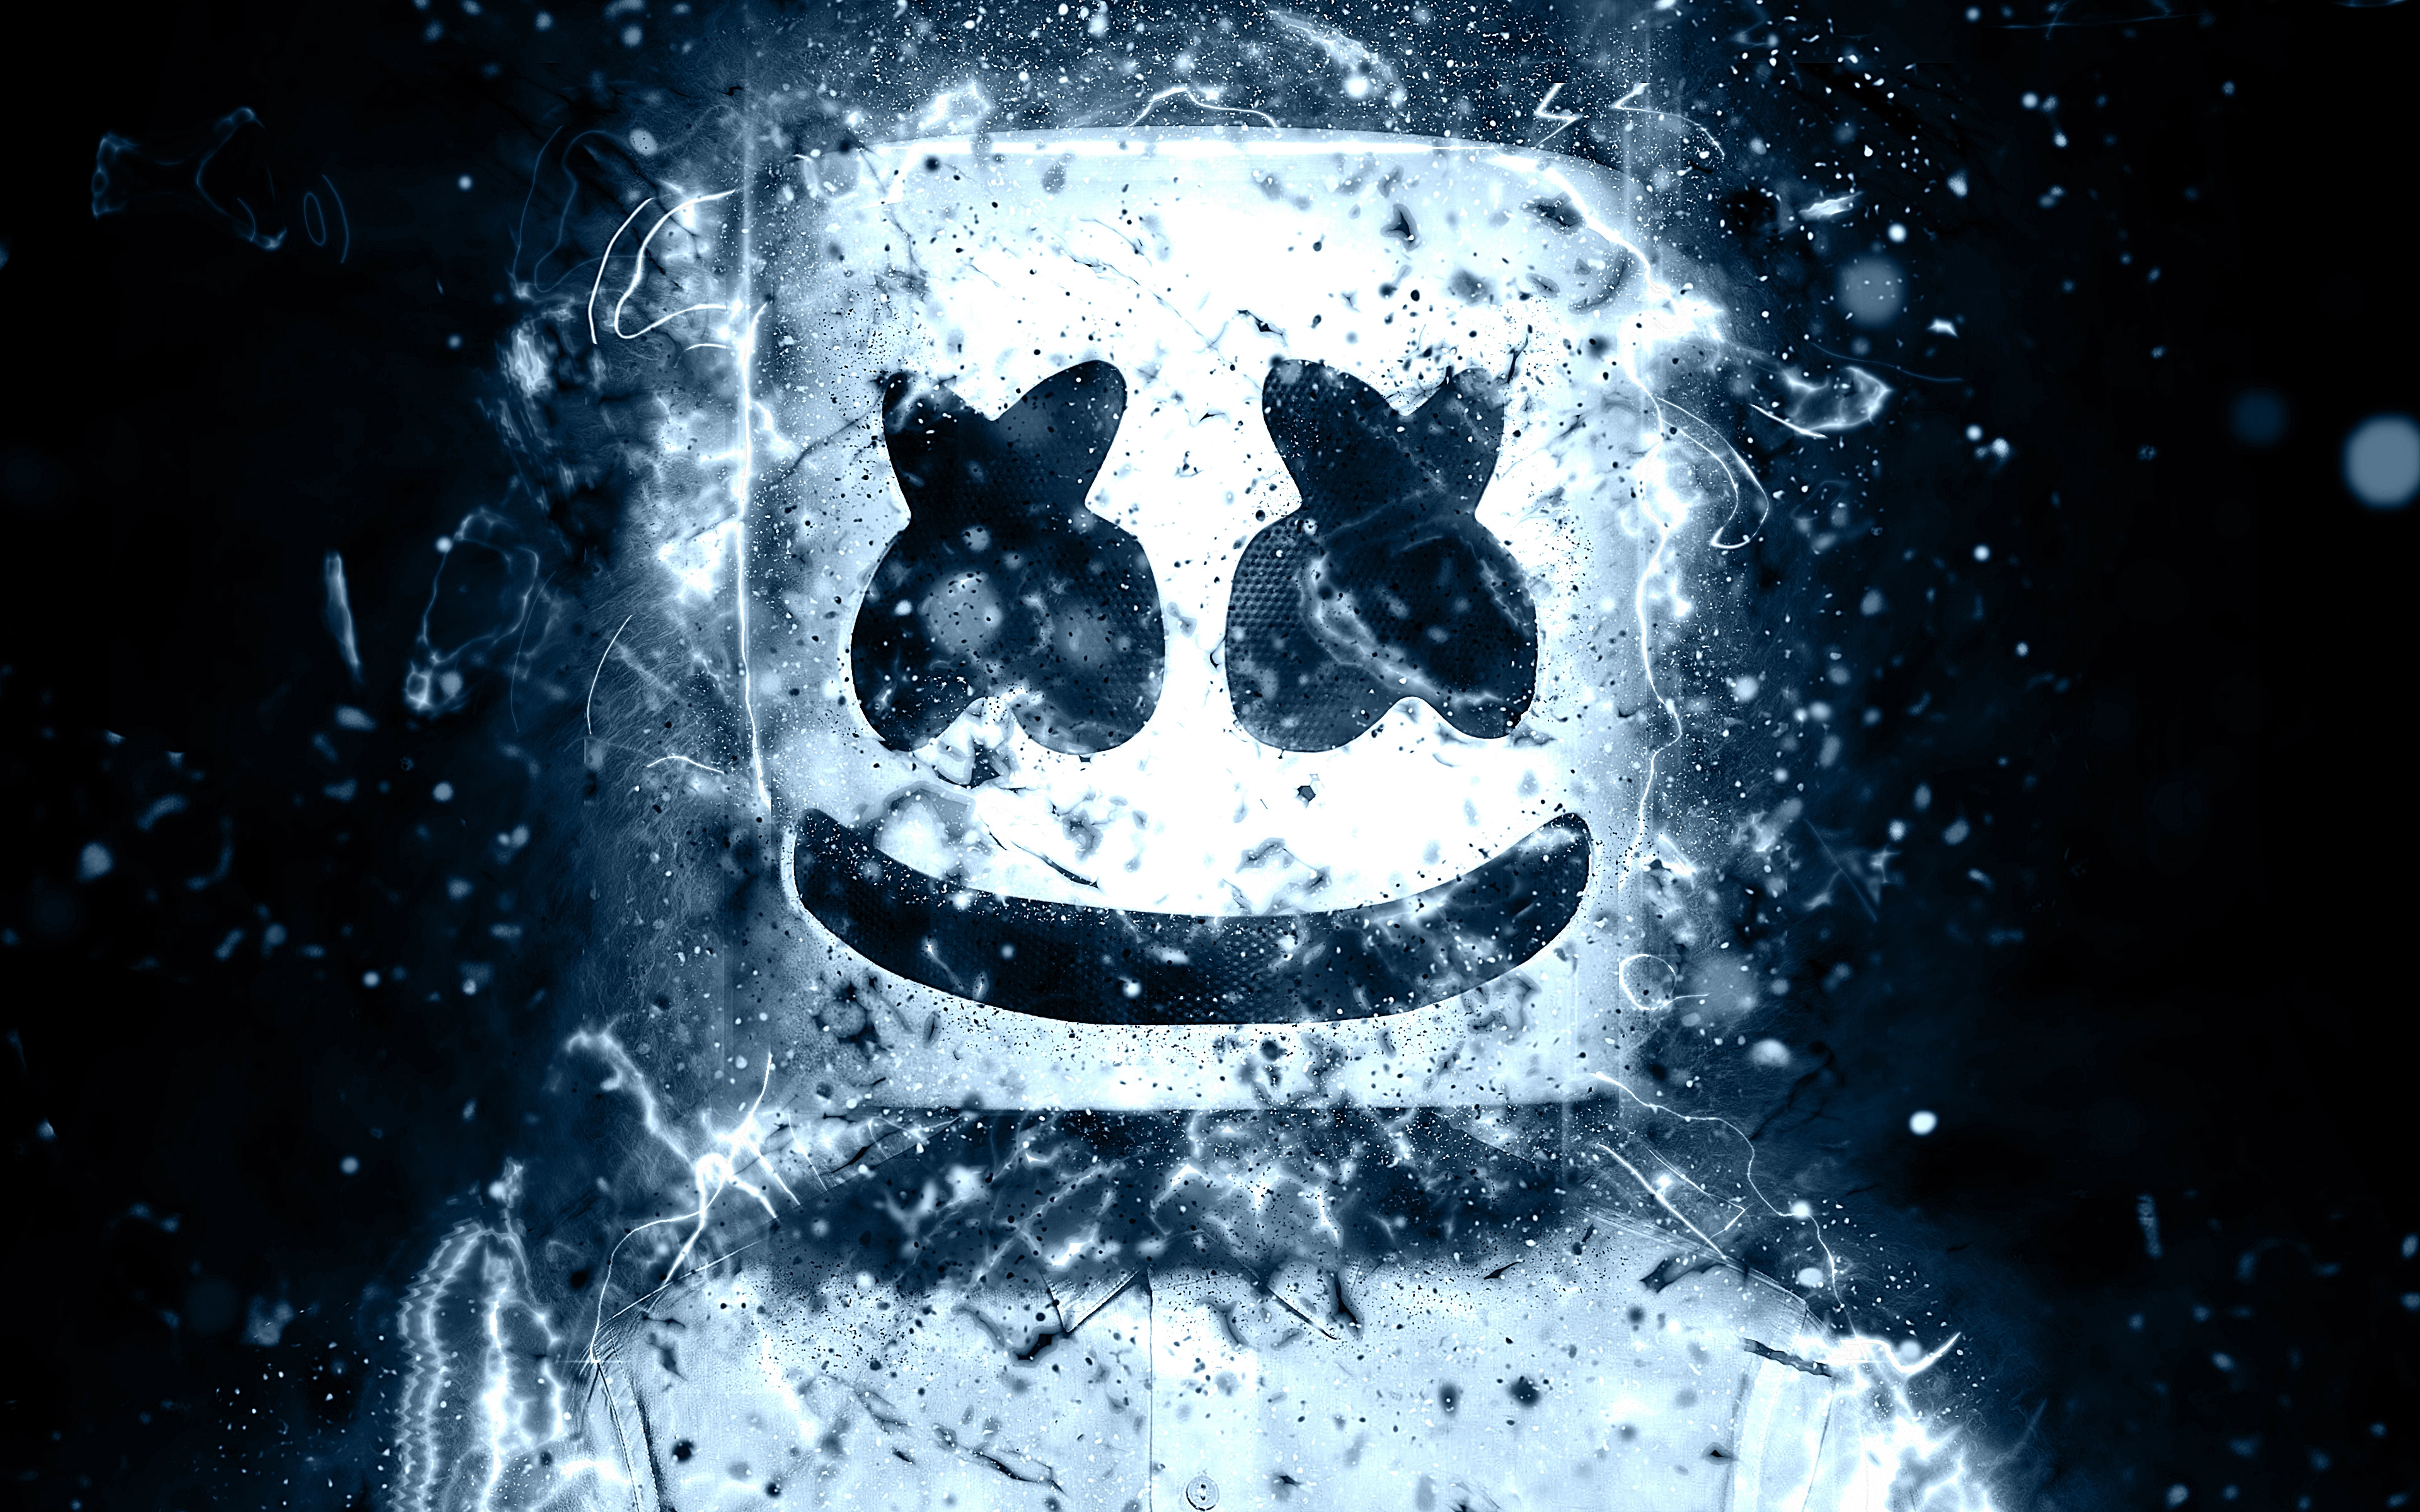 Wallpaper DJ Marshmello